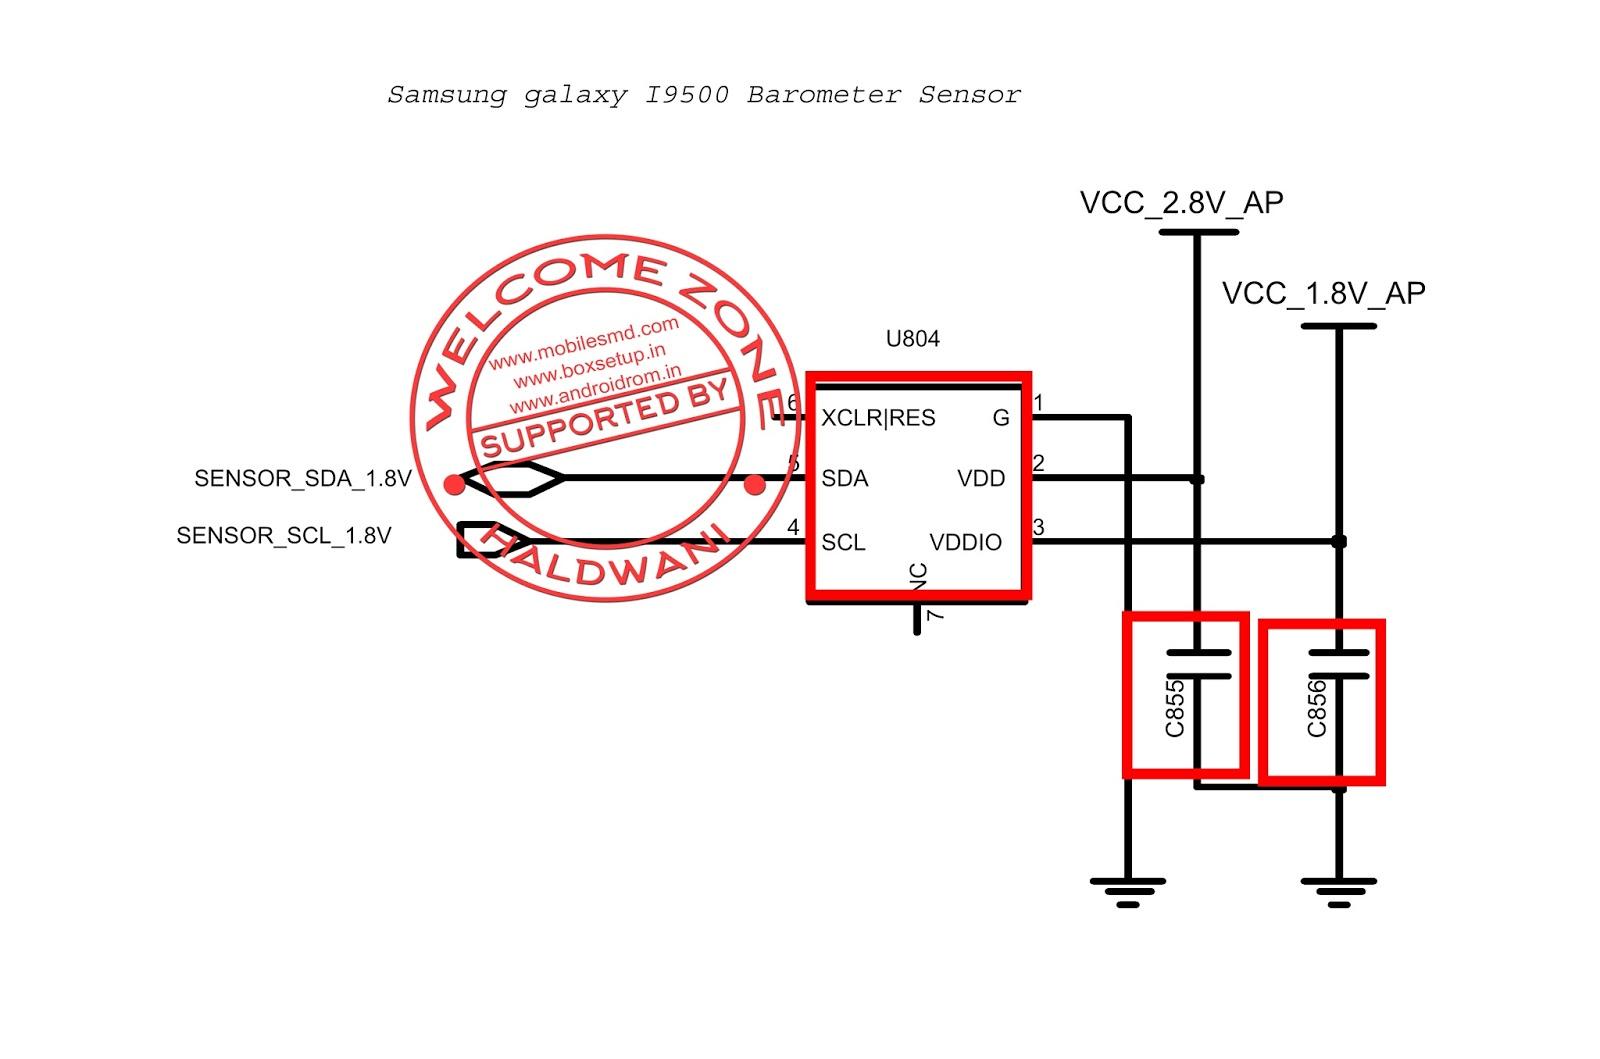 Samsung Galaxy S4 I9500 Barometer Sensor Part Not Working